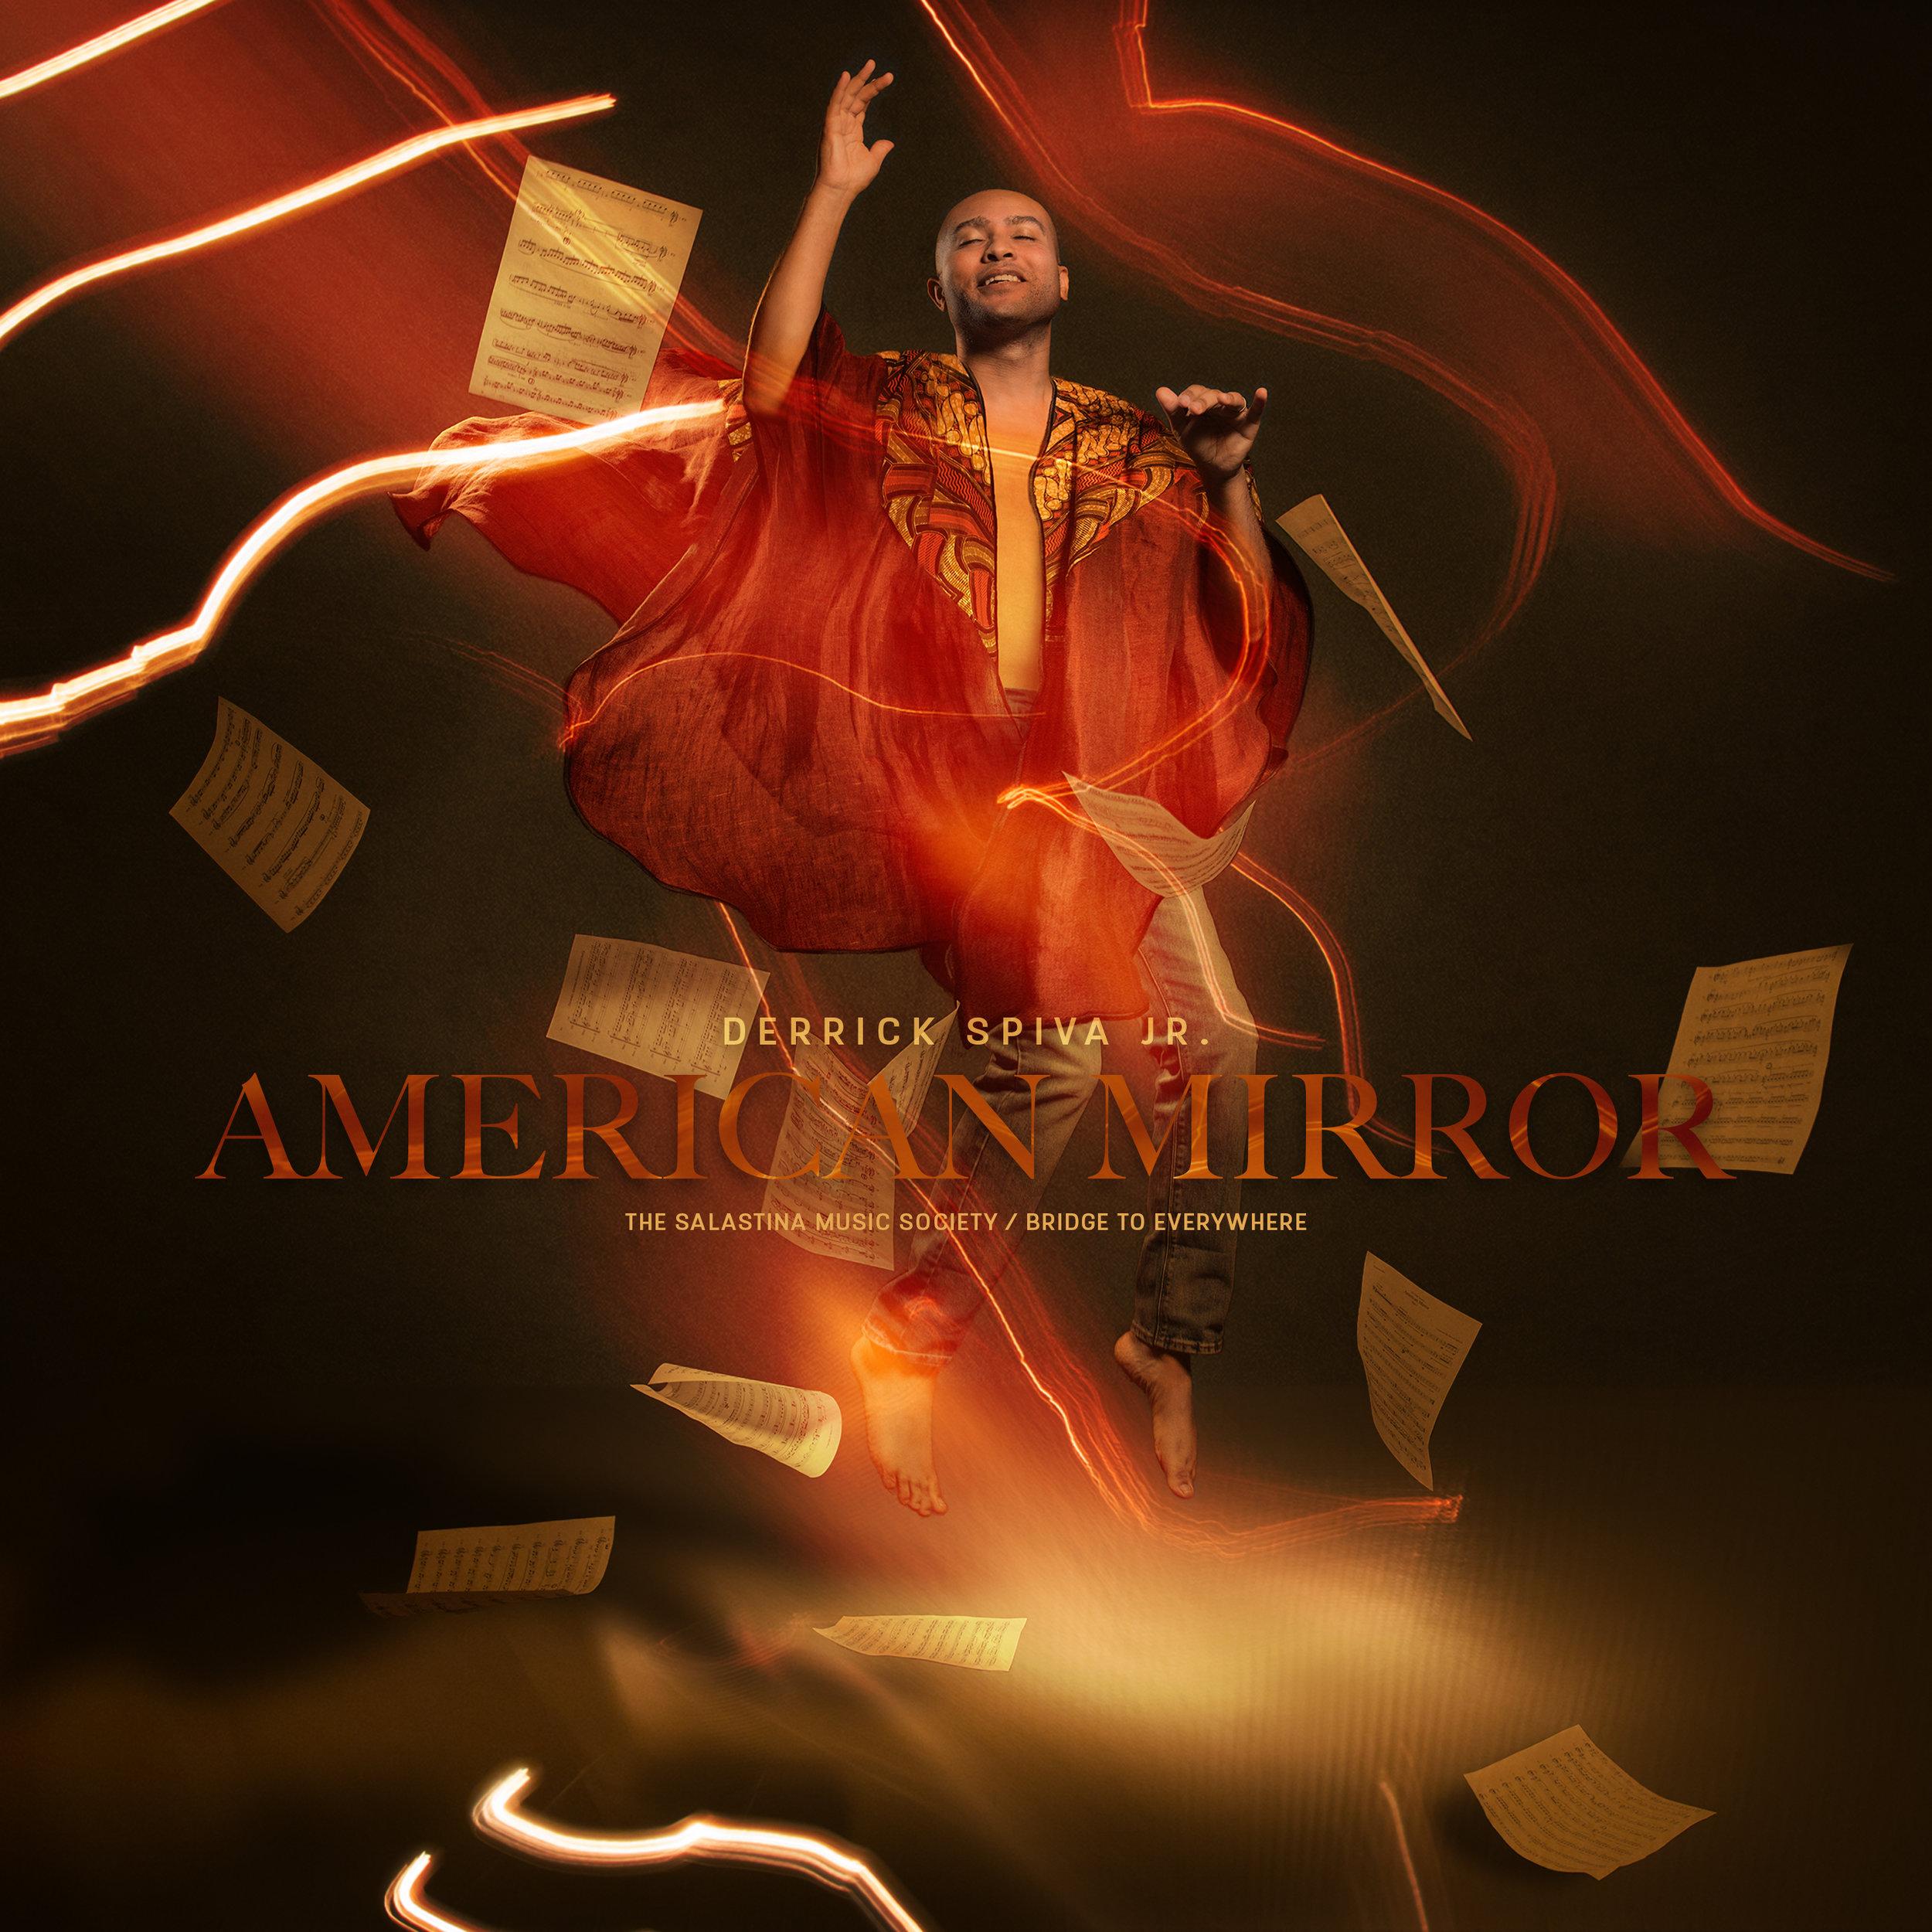 Derrick Spiva Jr. // American Mirror